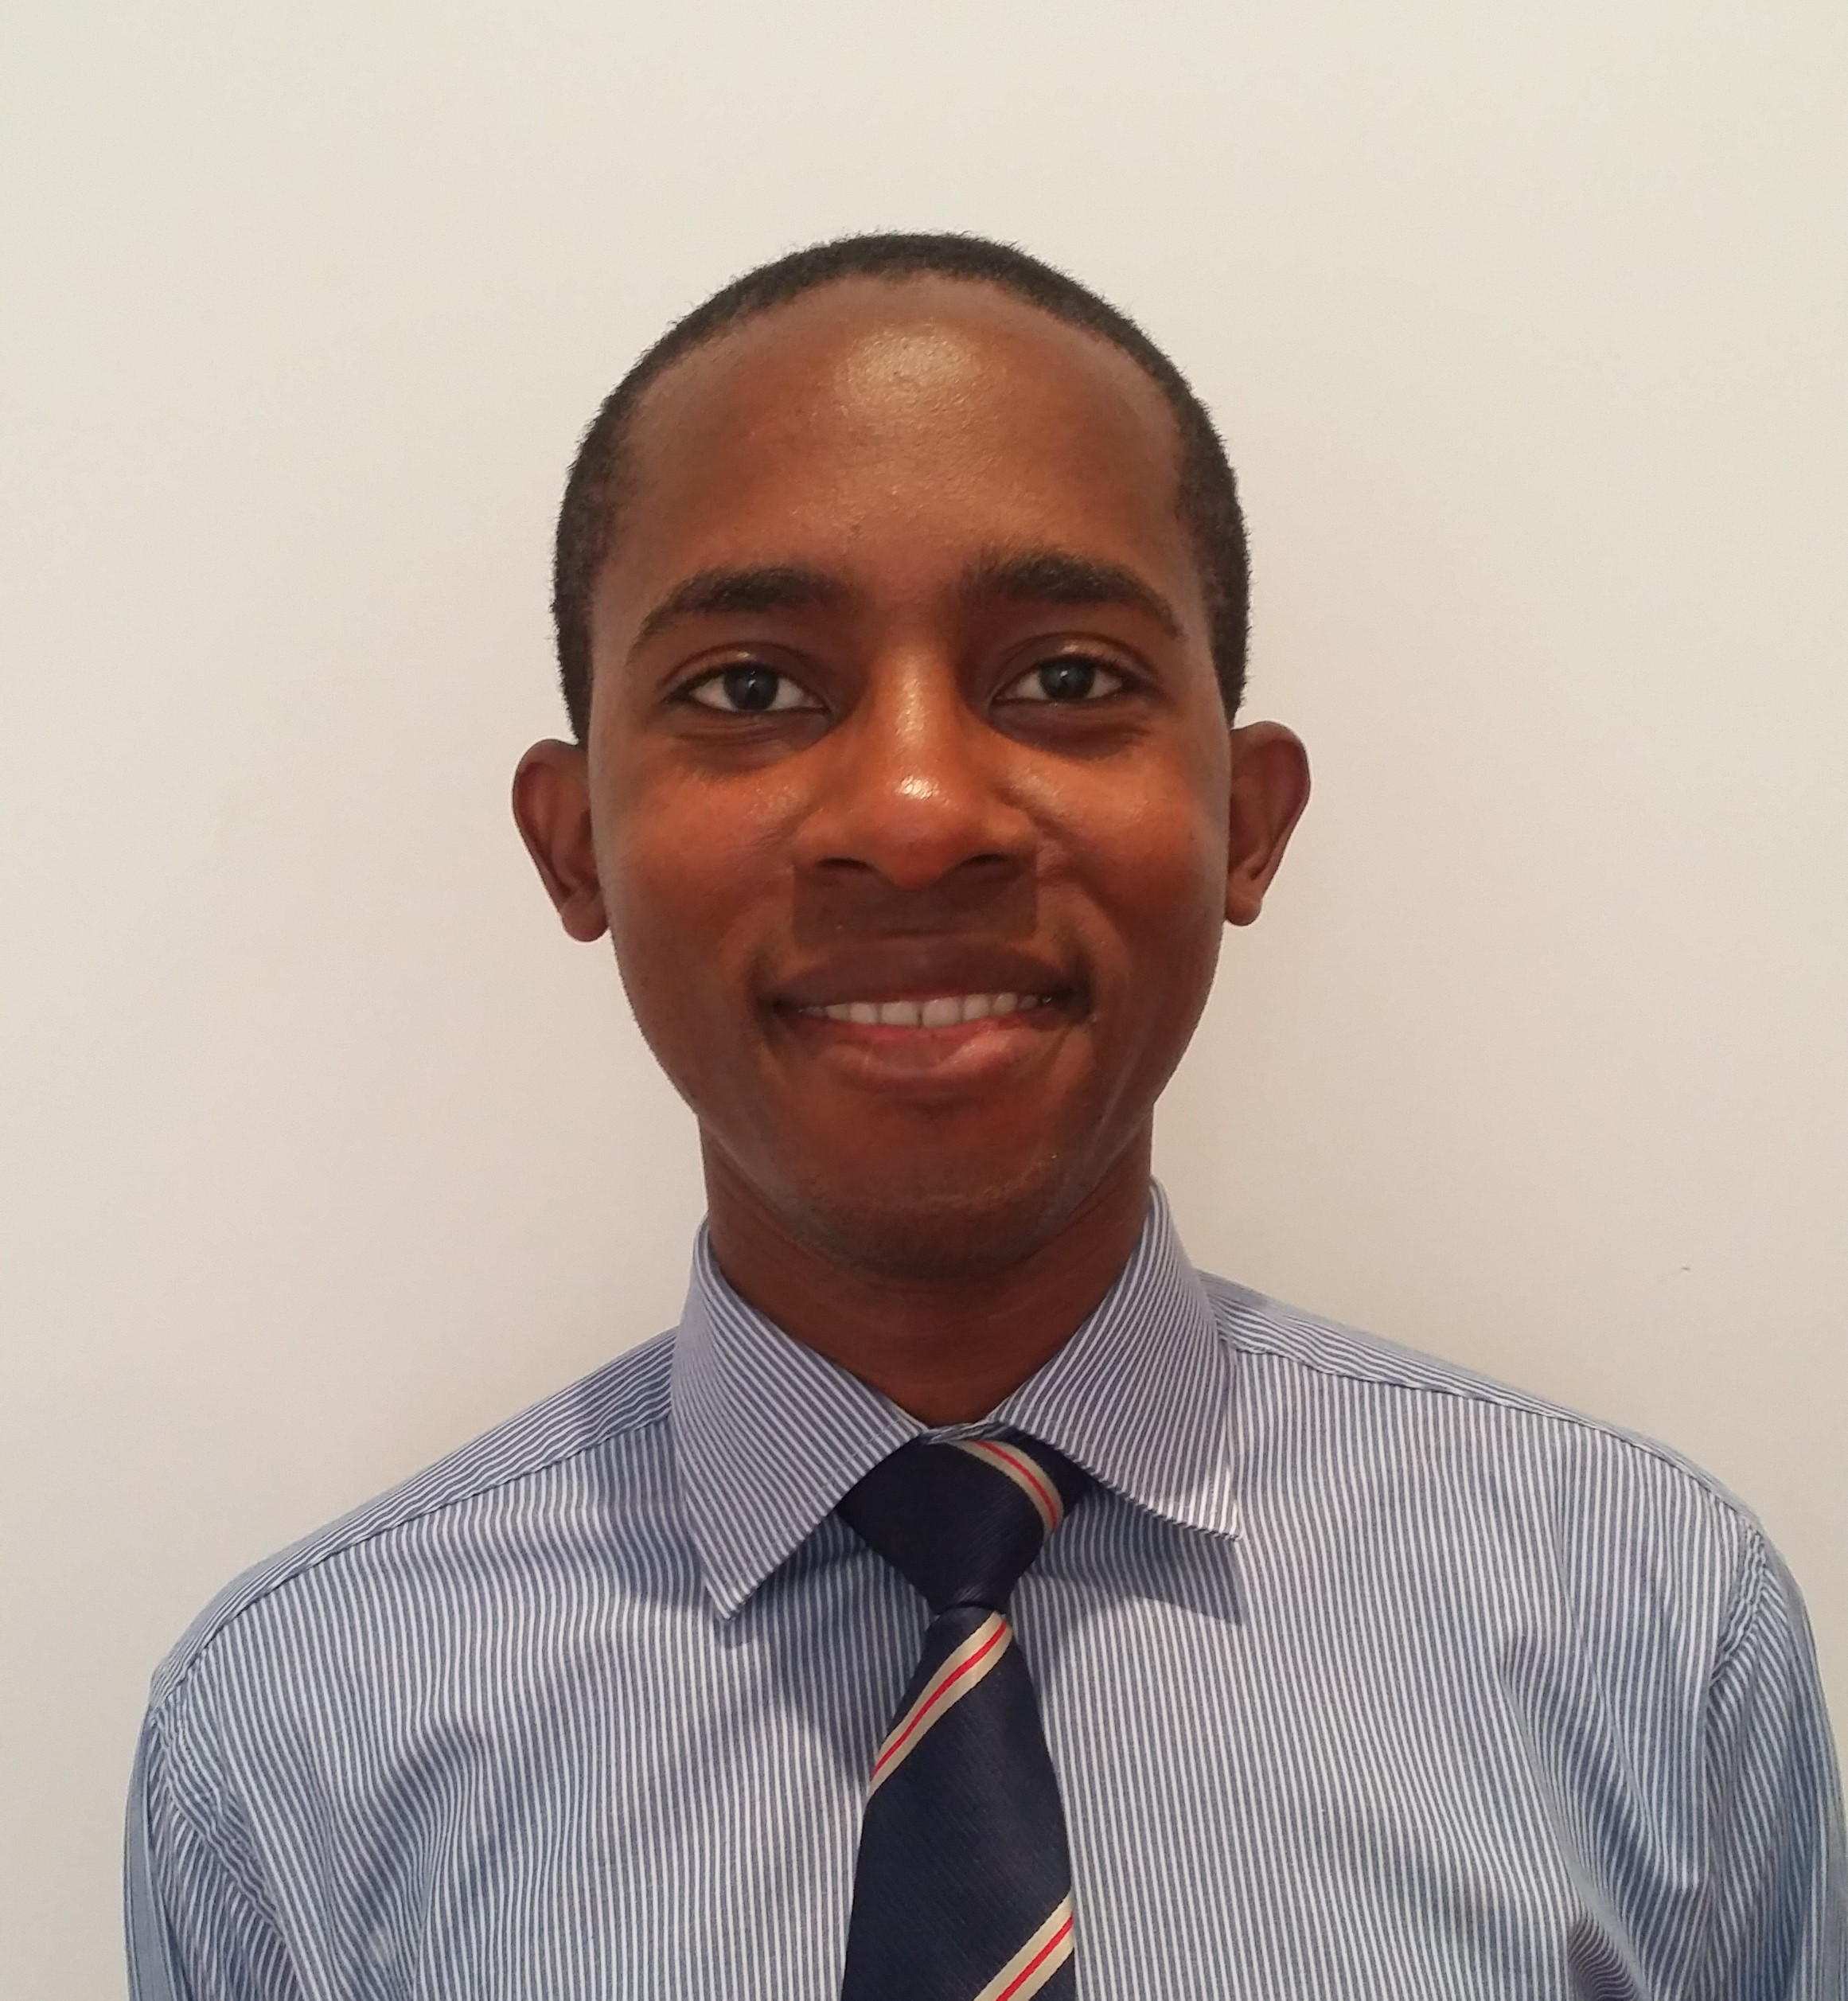 President - Dr. Tatenda Calvin Nzenza